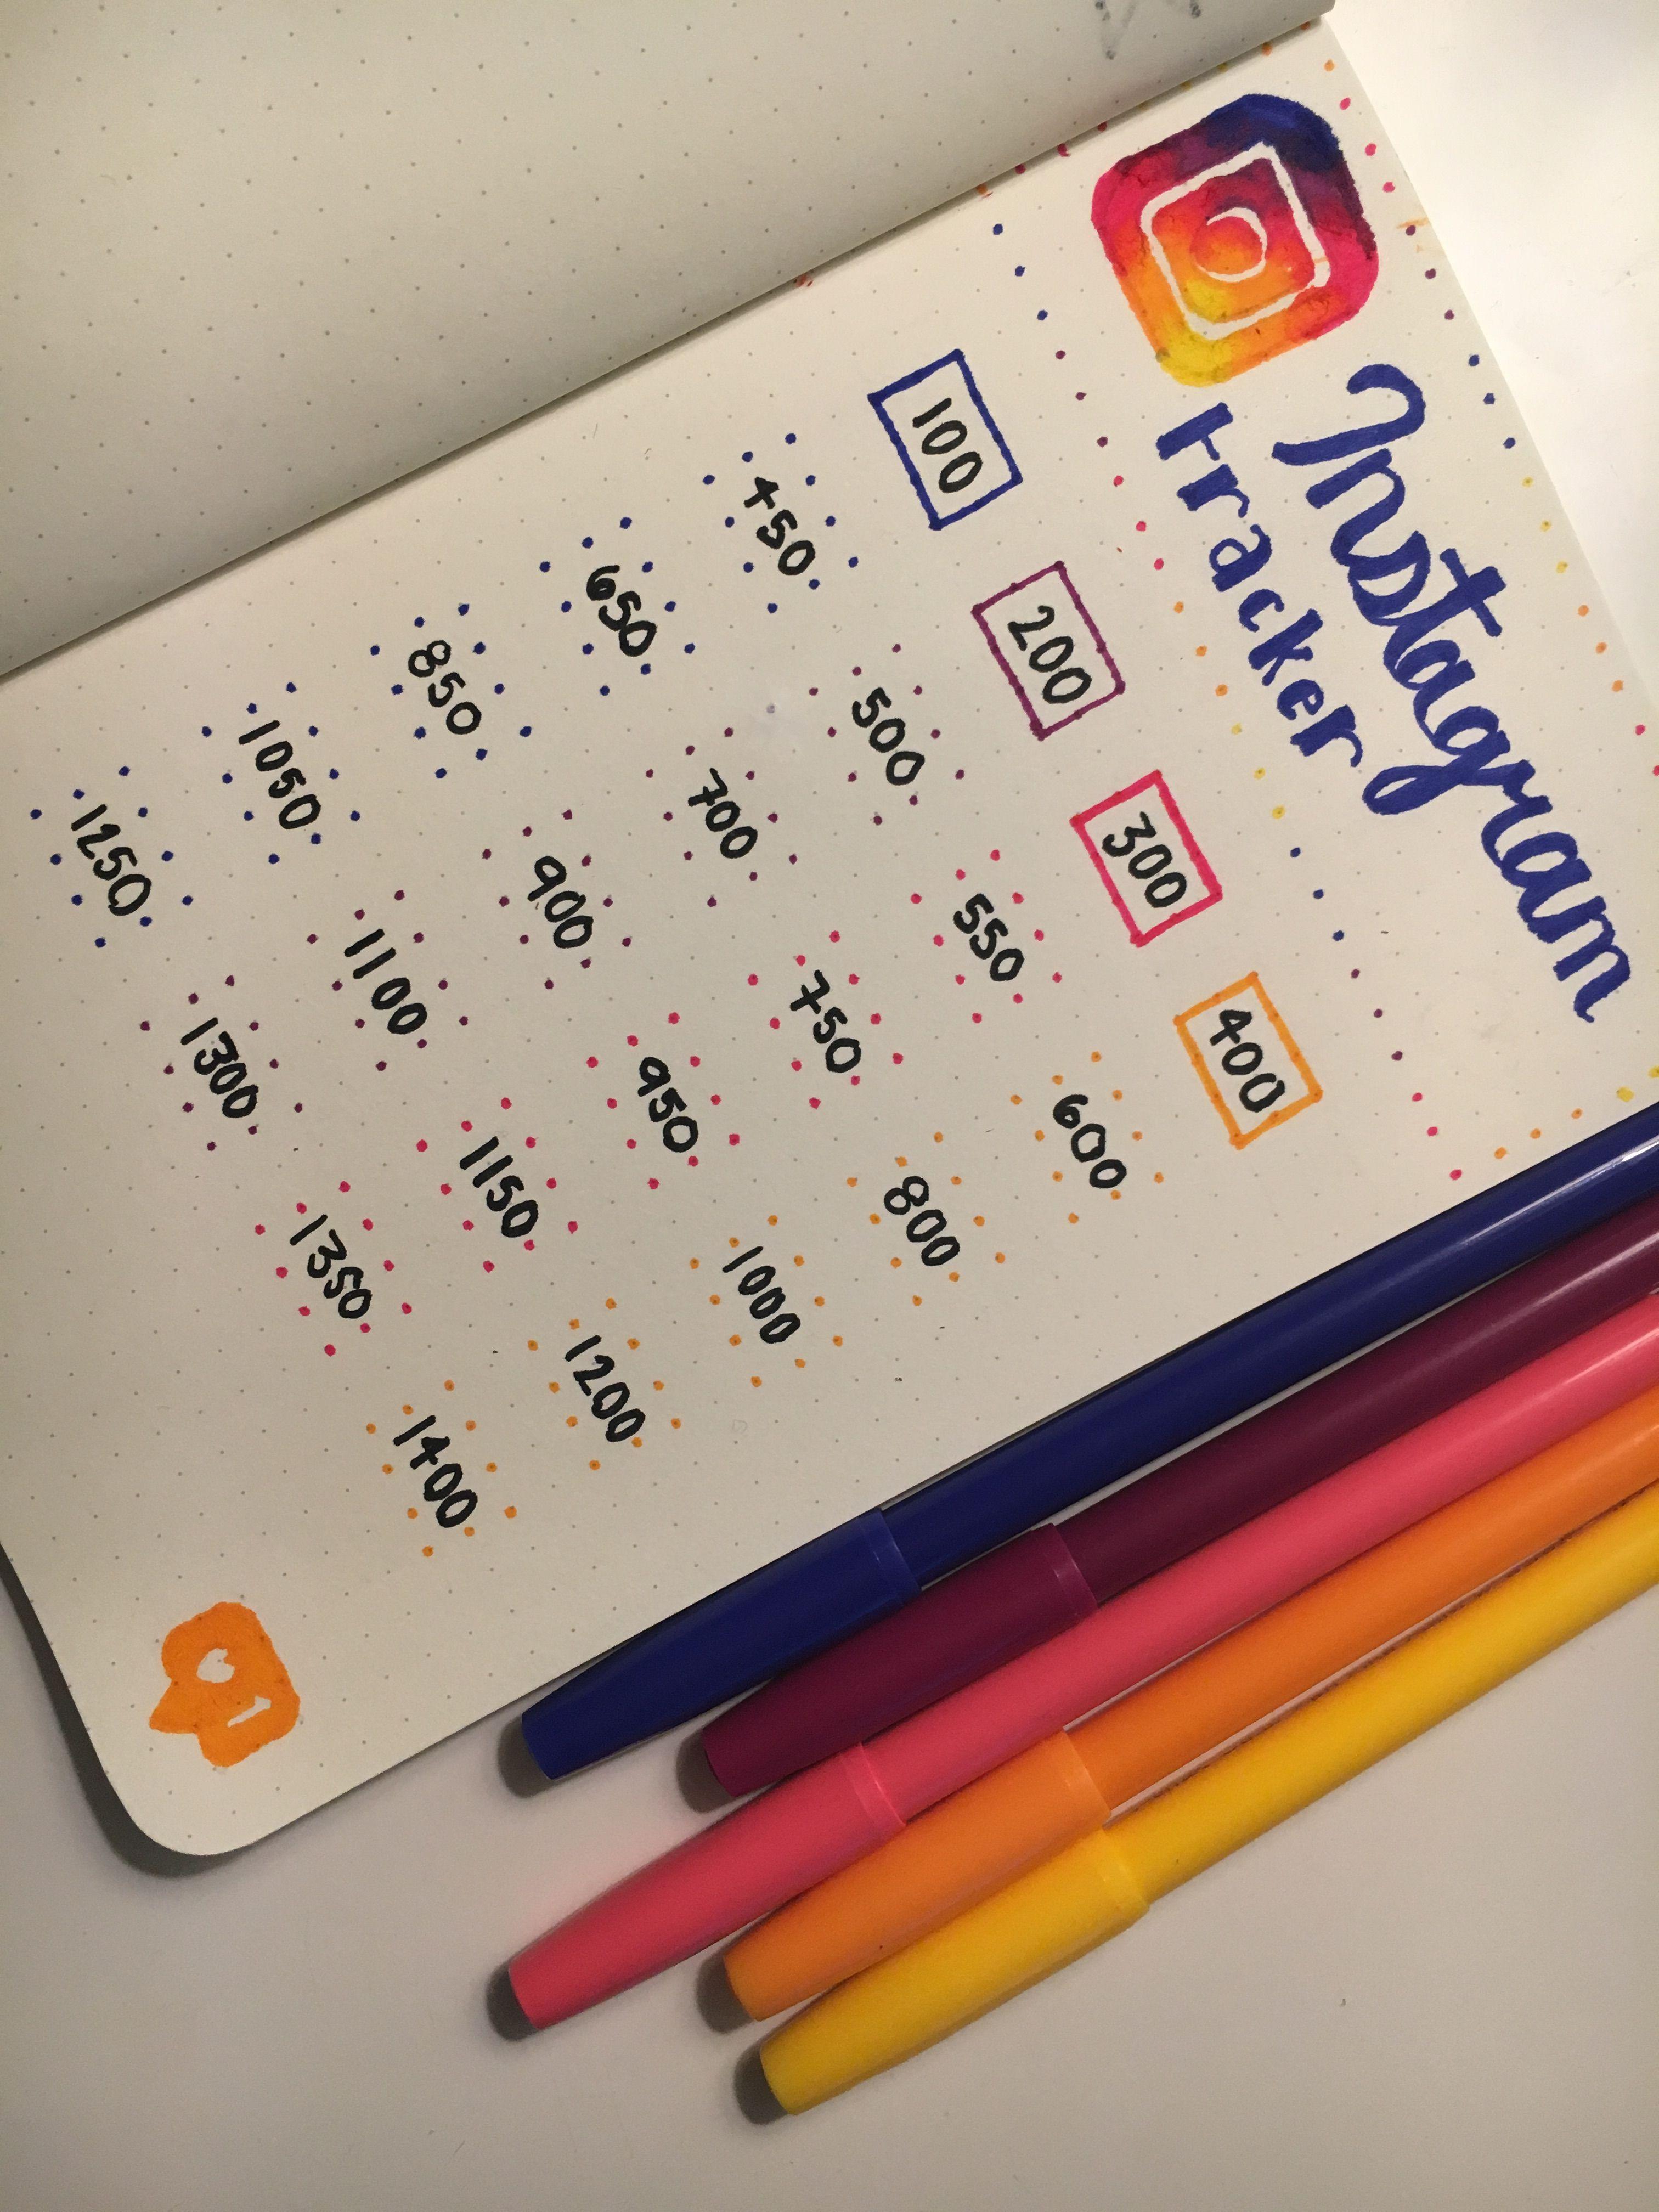 Bullet Journal Instagram Tracker August Yocher Crafts Stabilo Boss Orange Set 10 Shrink Inspiration